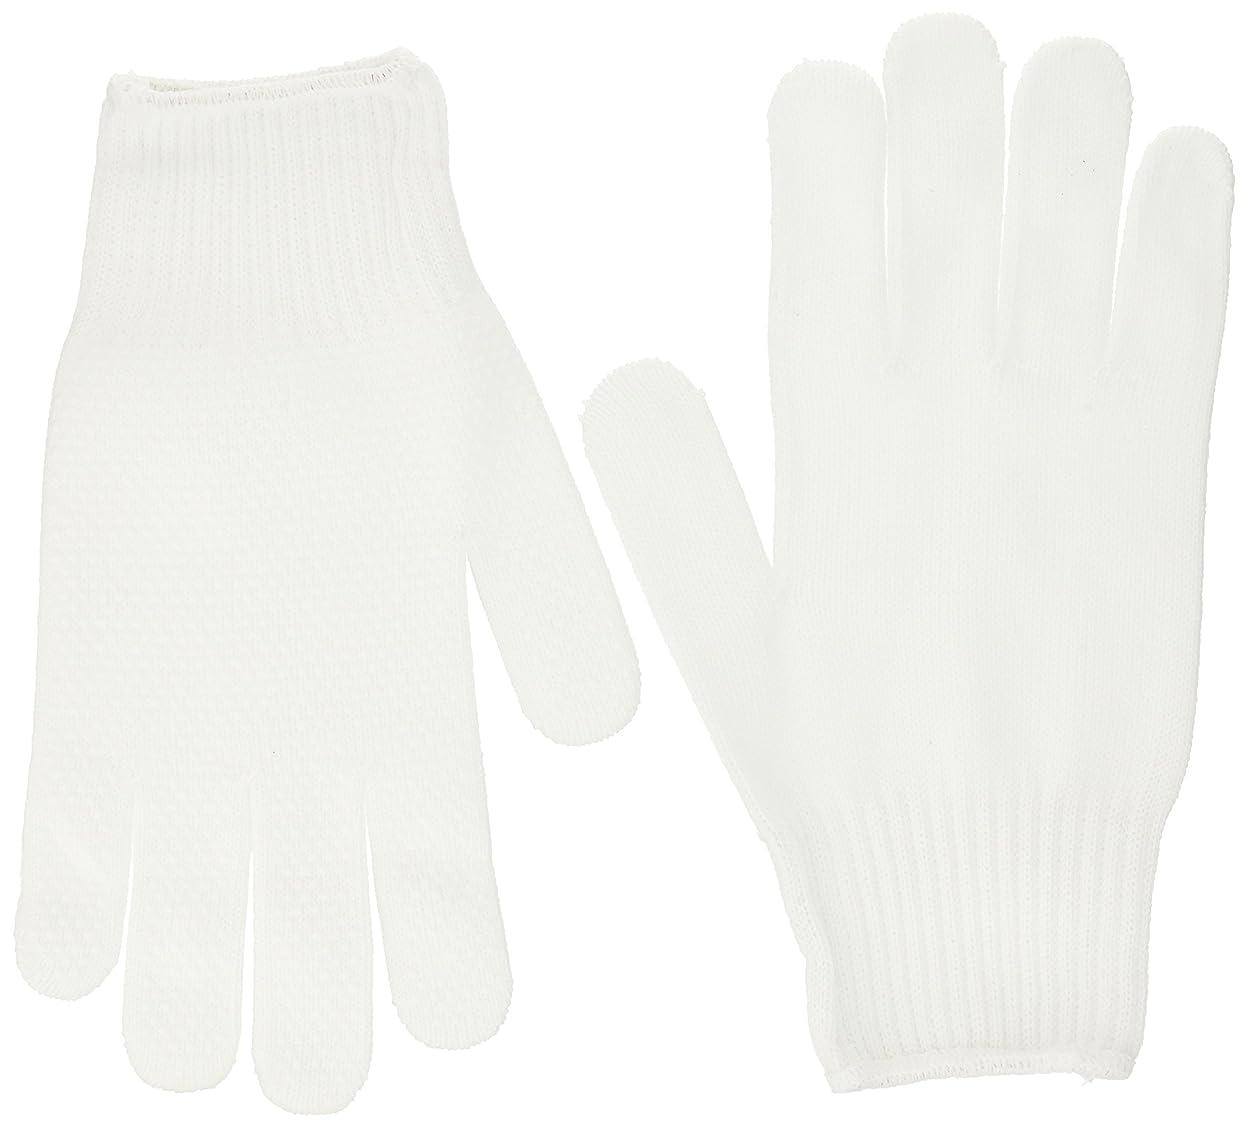 TRUSCO(トラスコ) 軽作業用すべり止め手袋 薄手 5双組 フリーサイズ DPM-39LE